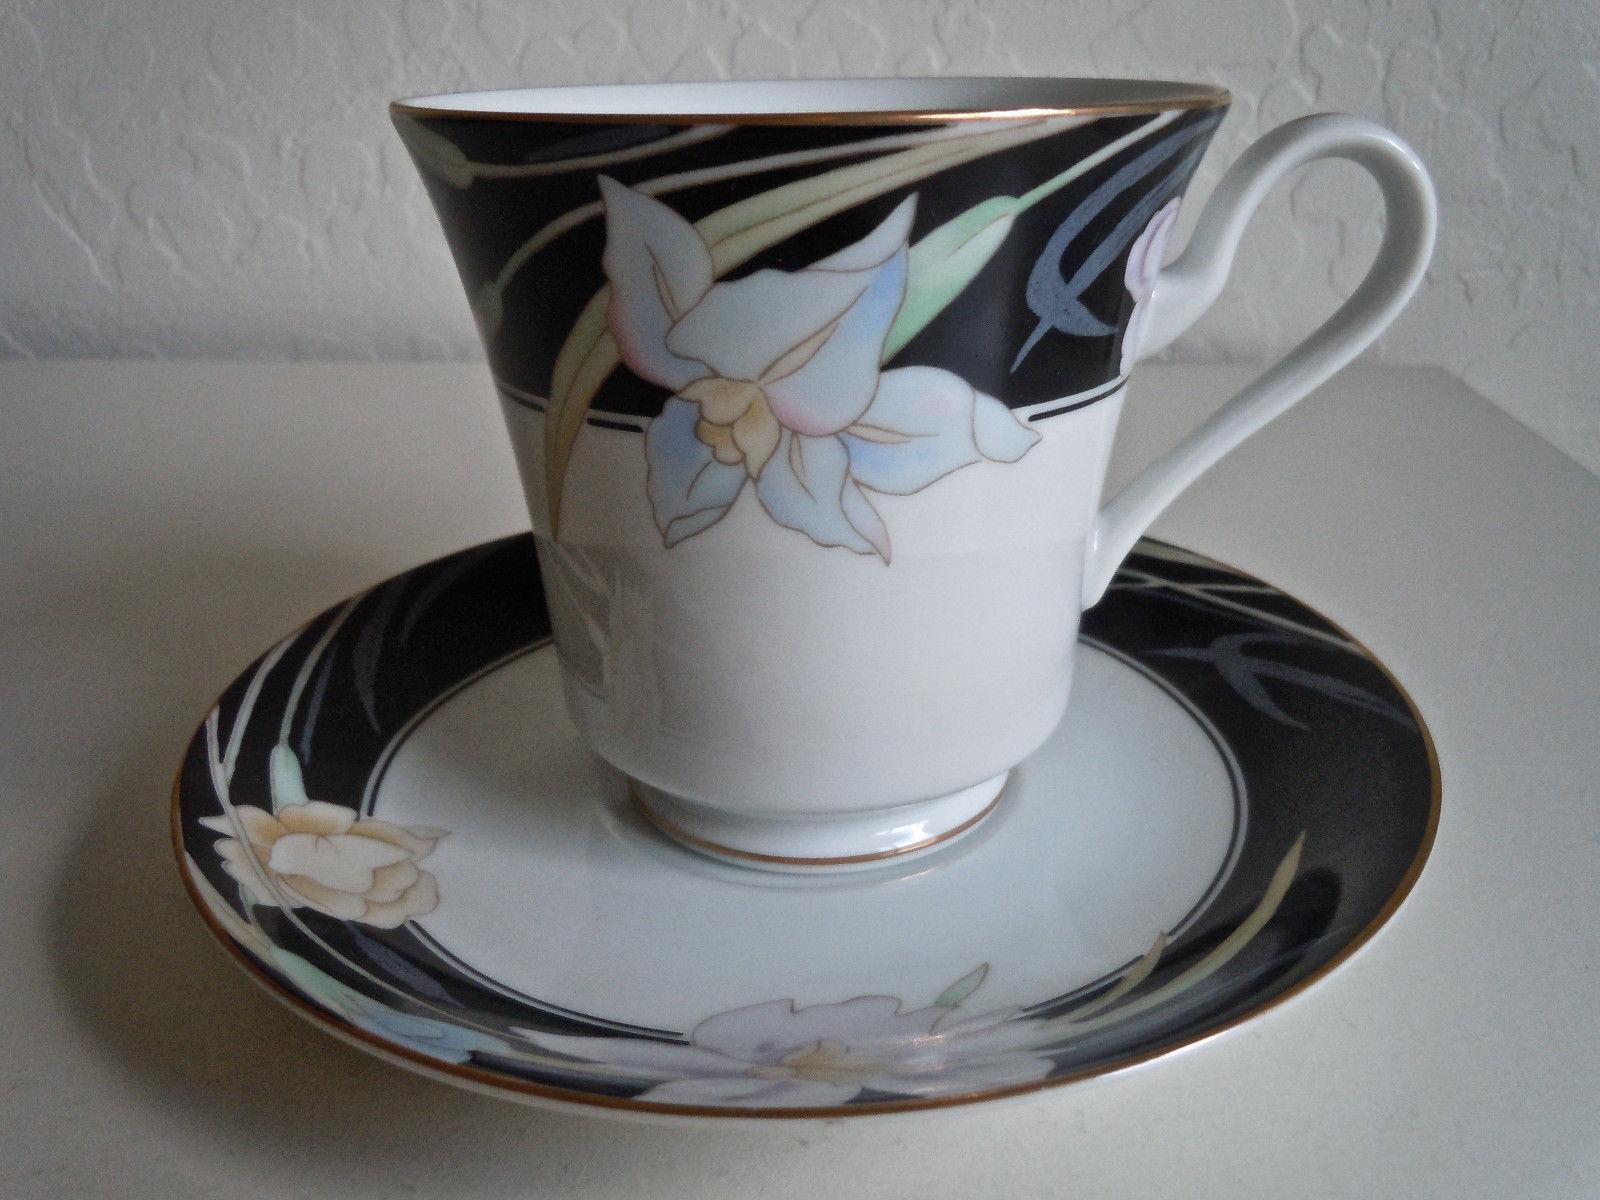 Mikasa Charisma Black Cup and Saucer Set and 50 similar items